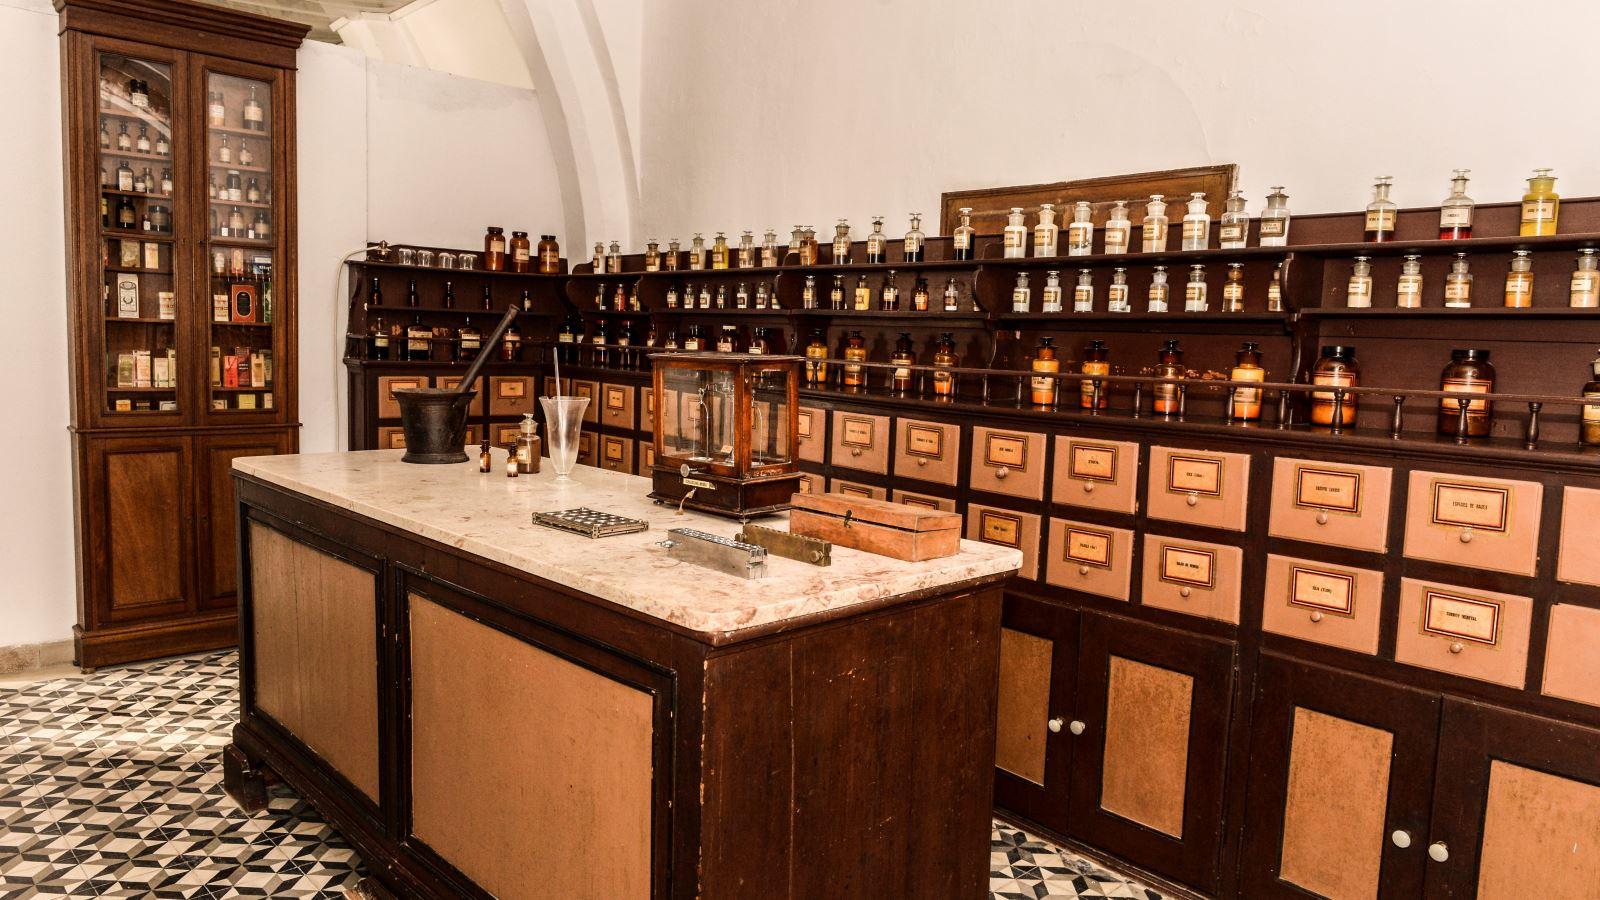 VI Jornadas de Museologia nas Misericórdias